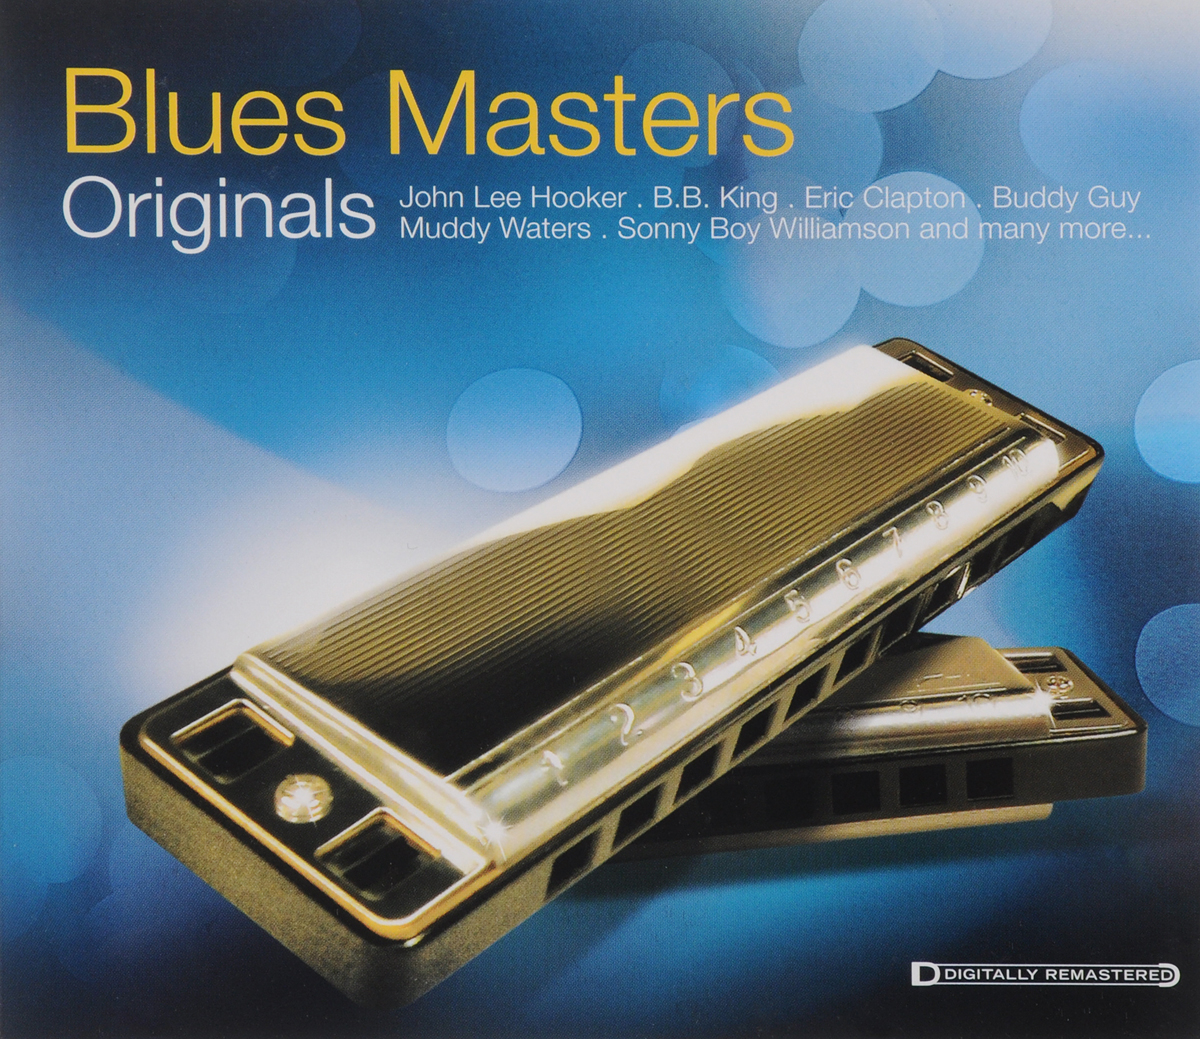 Джон Ли Хукер,Мадди Уотерс,Элмор Джеймс,Би Би Кинг,Мемфис Слим,Лайтнин Хопкинс,Сонни Бой Вильямсон,Джимми Рид,Эрик Клэптон,Лидбелли Blues Masters. Originals